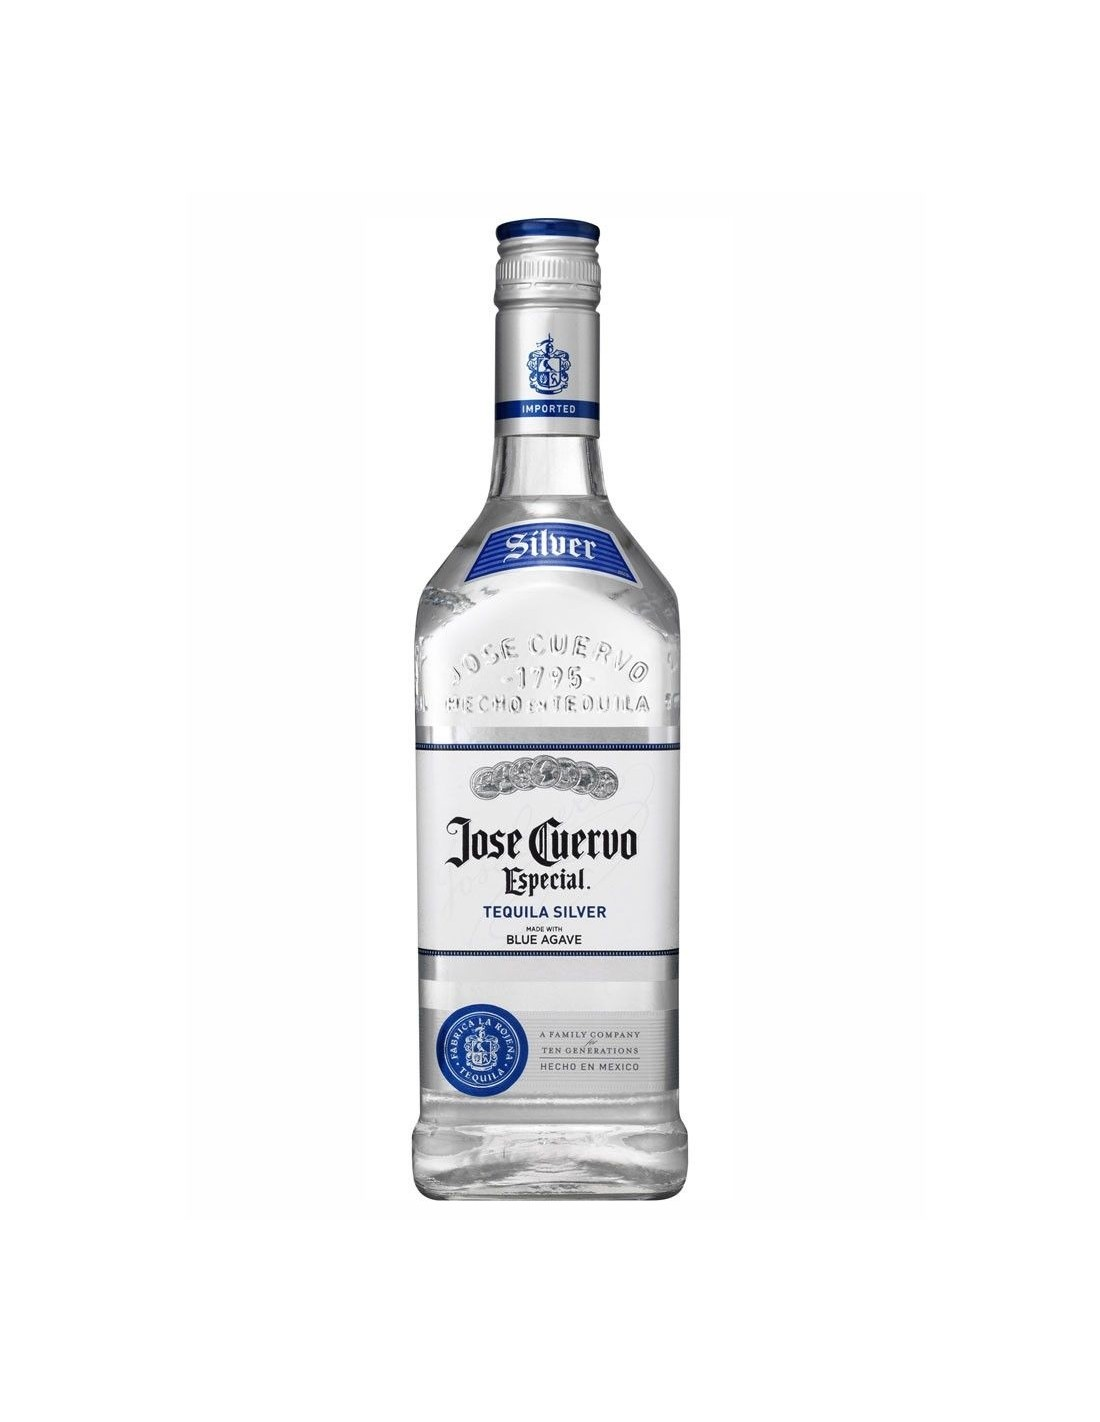 Tequila alba Jose Cuervo Especial Silver 0.7L, 38% alc., Mexic